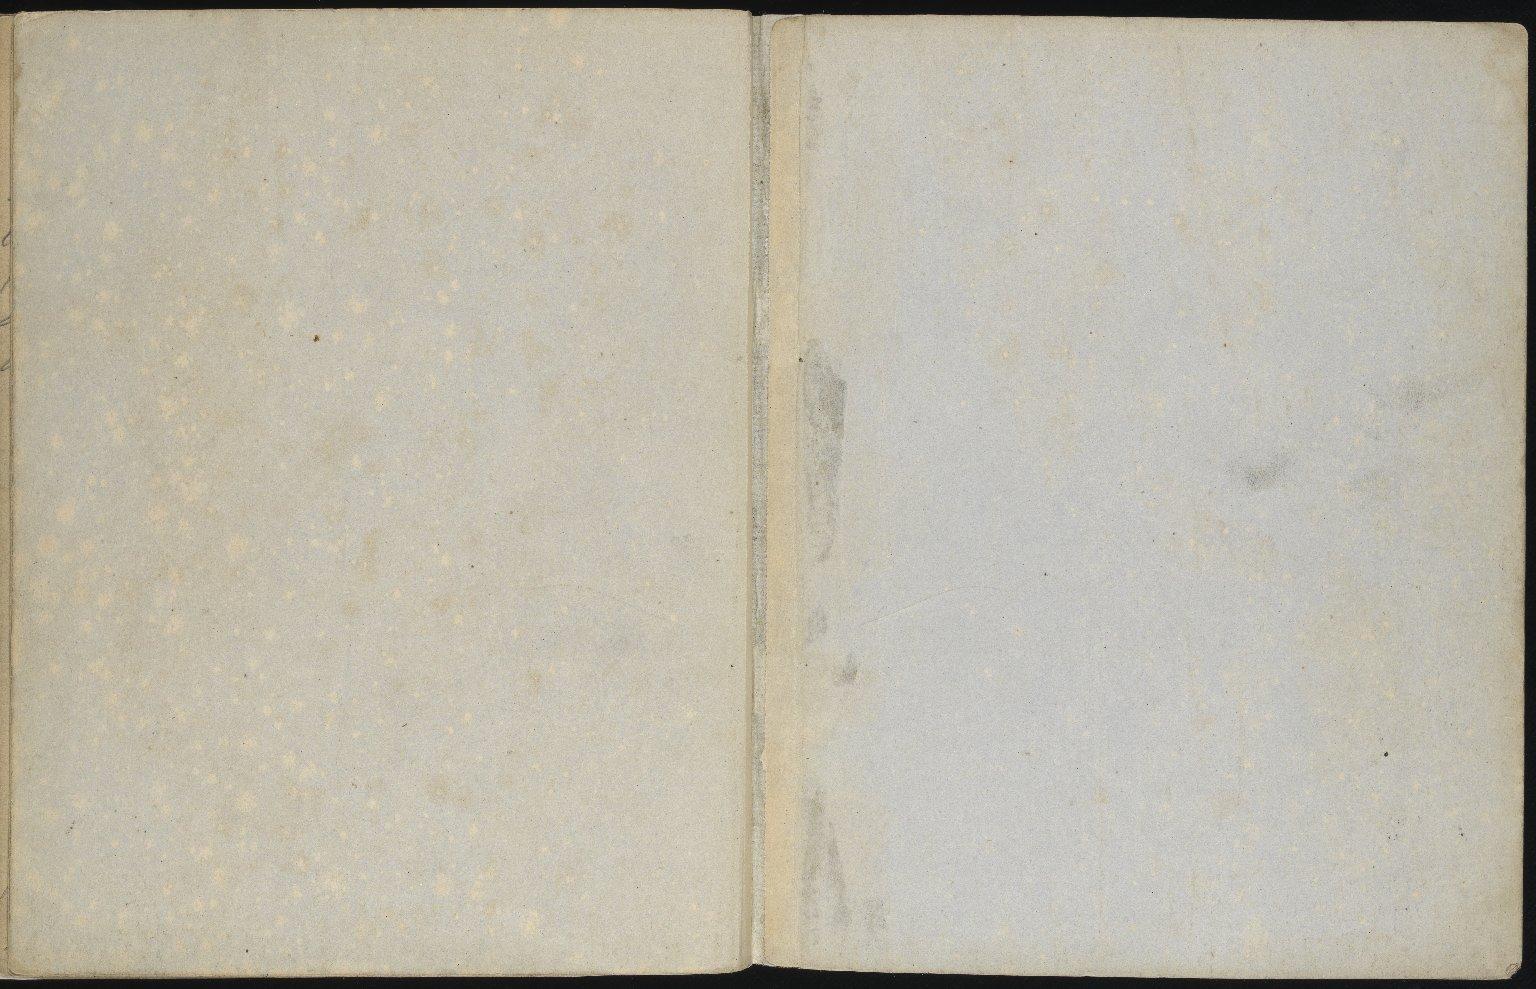 Field Notebook, f.68v & inside back cover